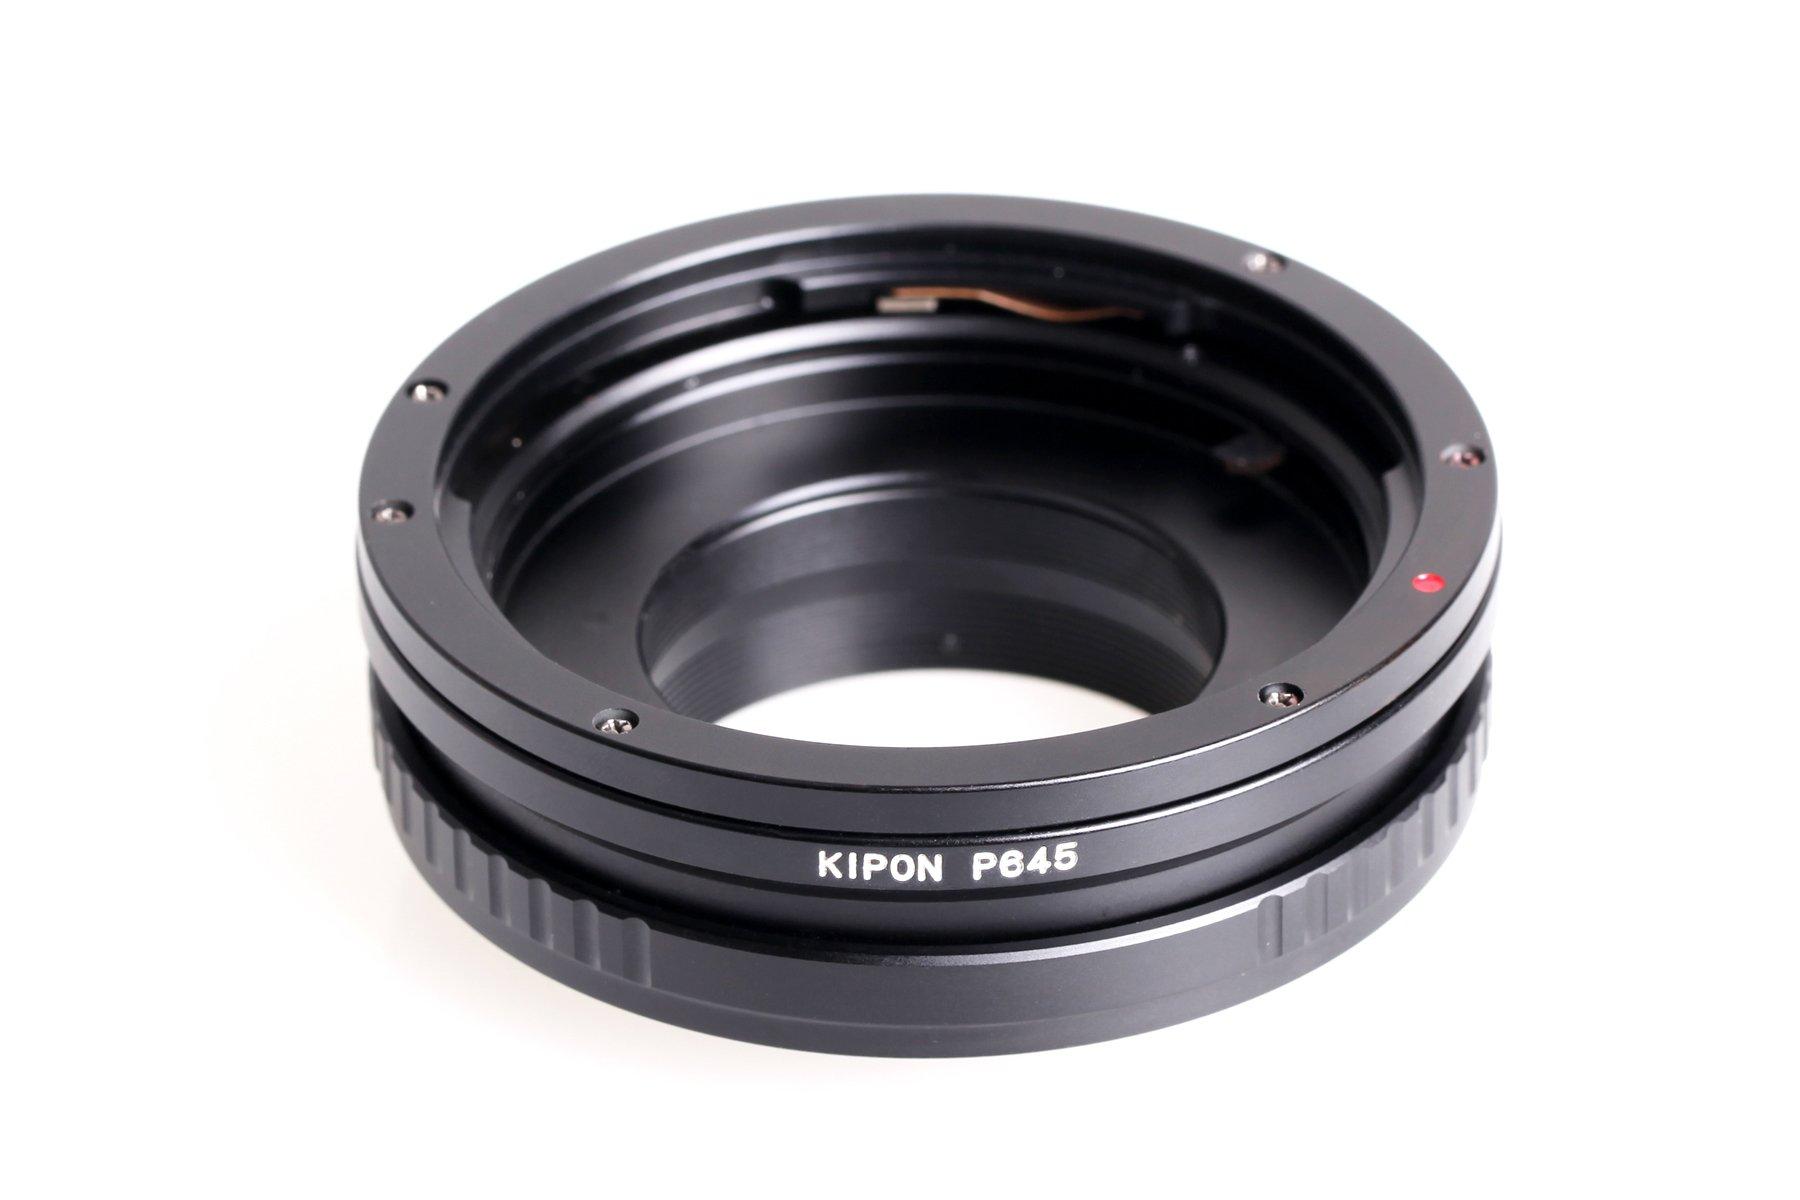 KIPON adaptér objektivu Pentax 645 na tělo Nikon